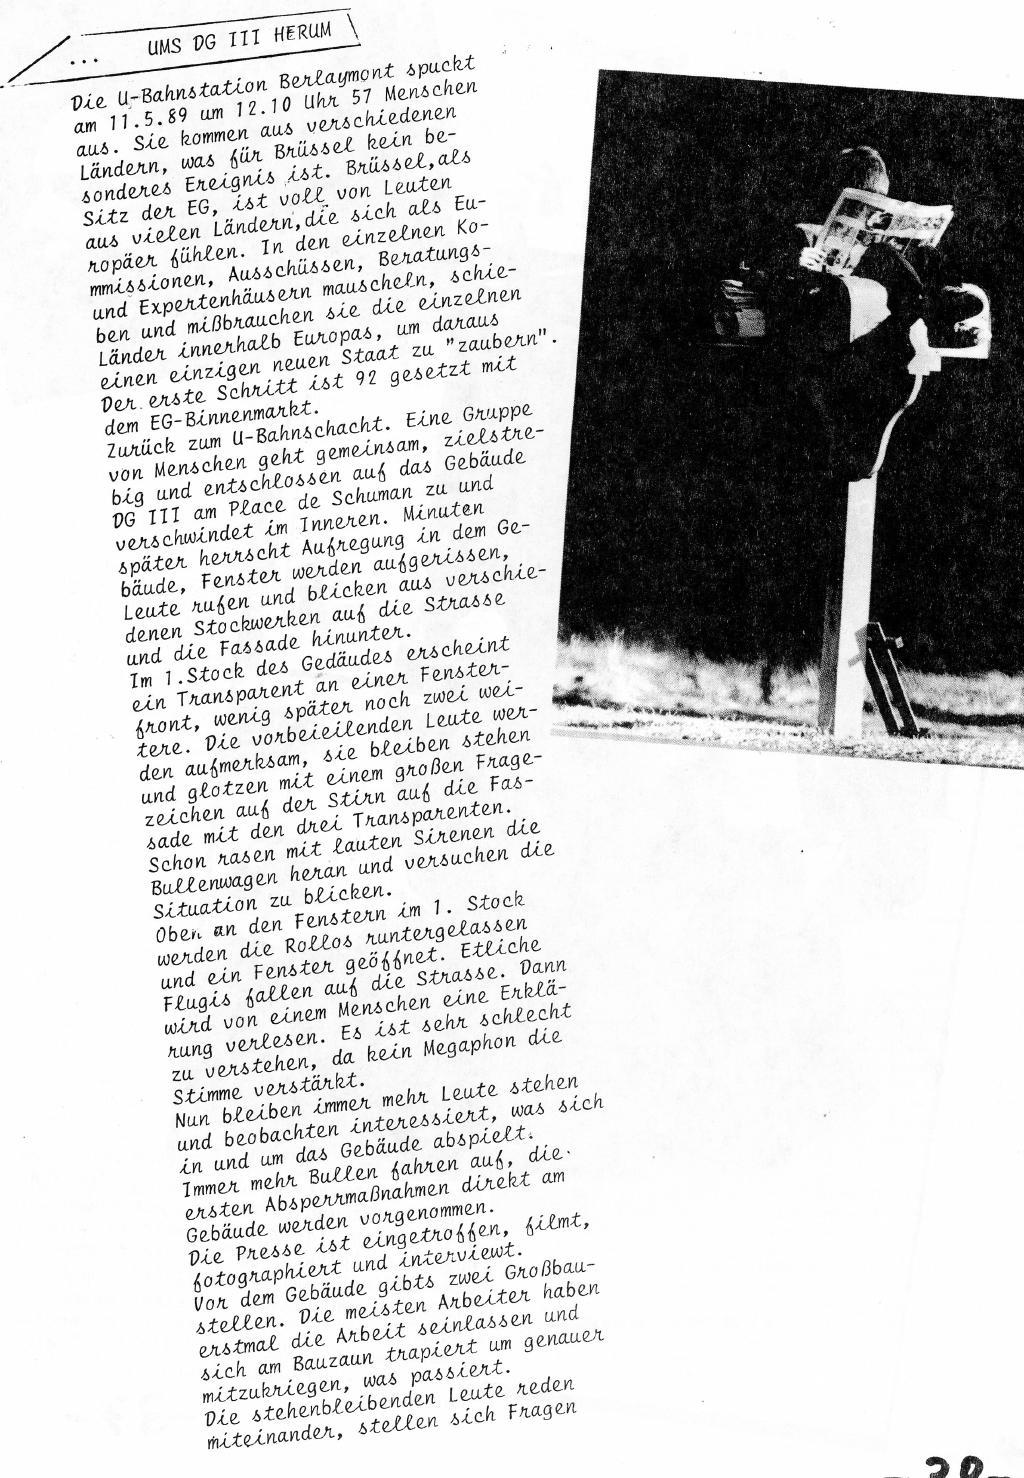 Belgien_Doku_Besetzung_EG_Kommission_1989_040